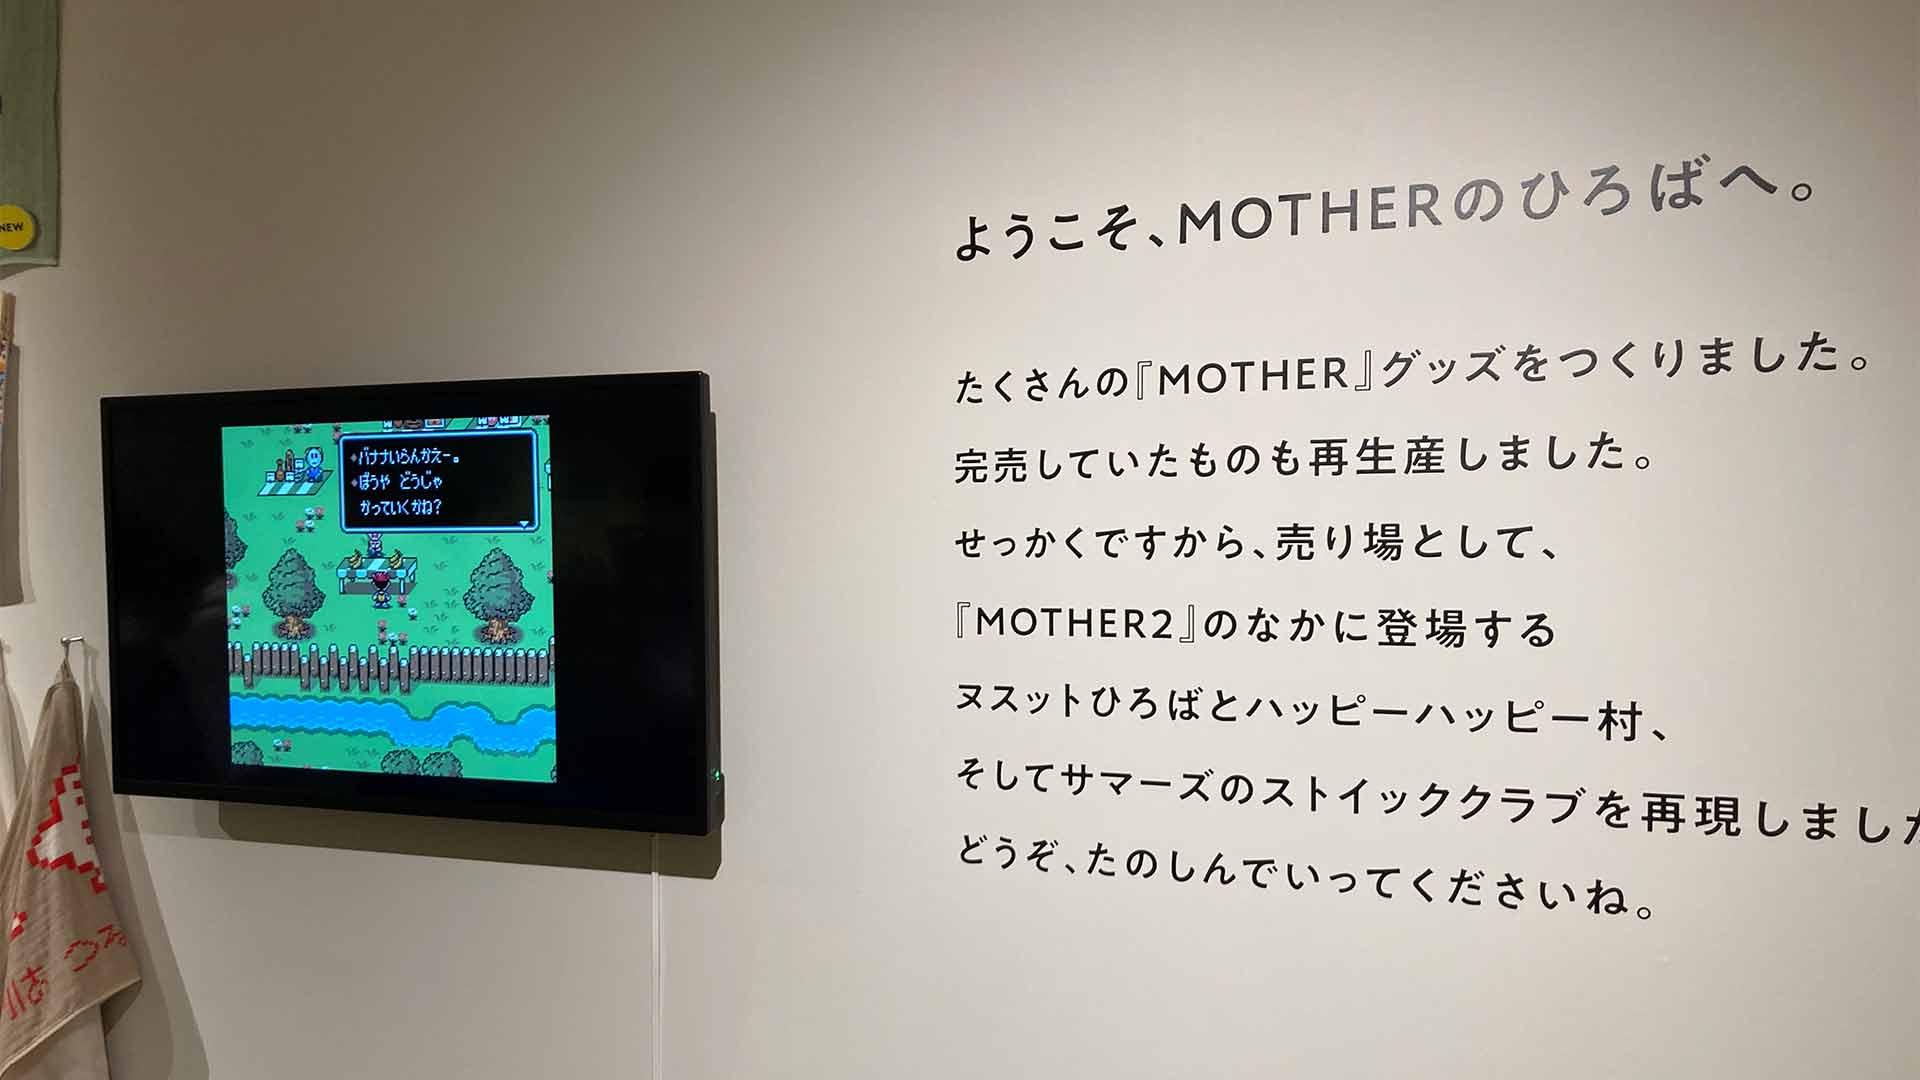 MOTHER2,MOTHERのひろば,ほぼ日,渋谷パルコ,イベント,レトロゲーム,レポート